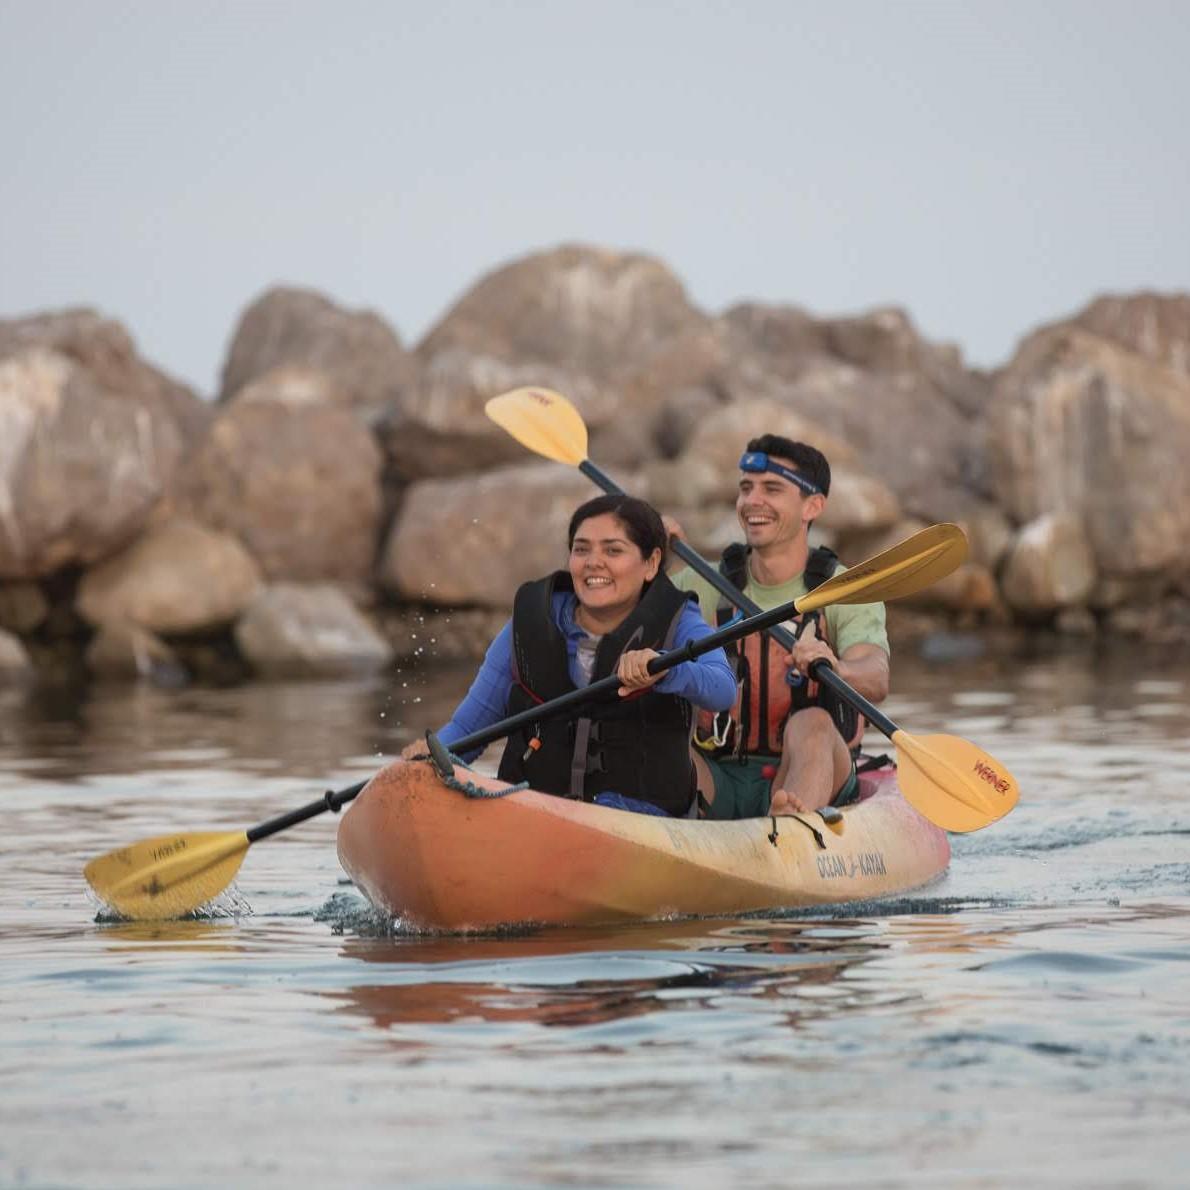 Two folx paddling a kayak